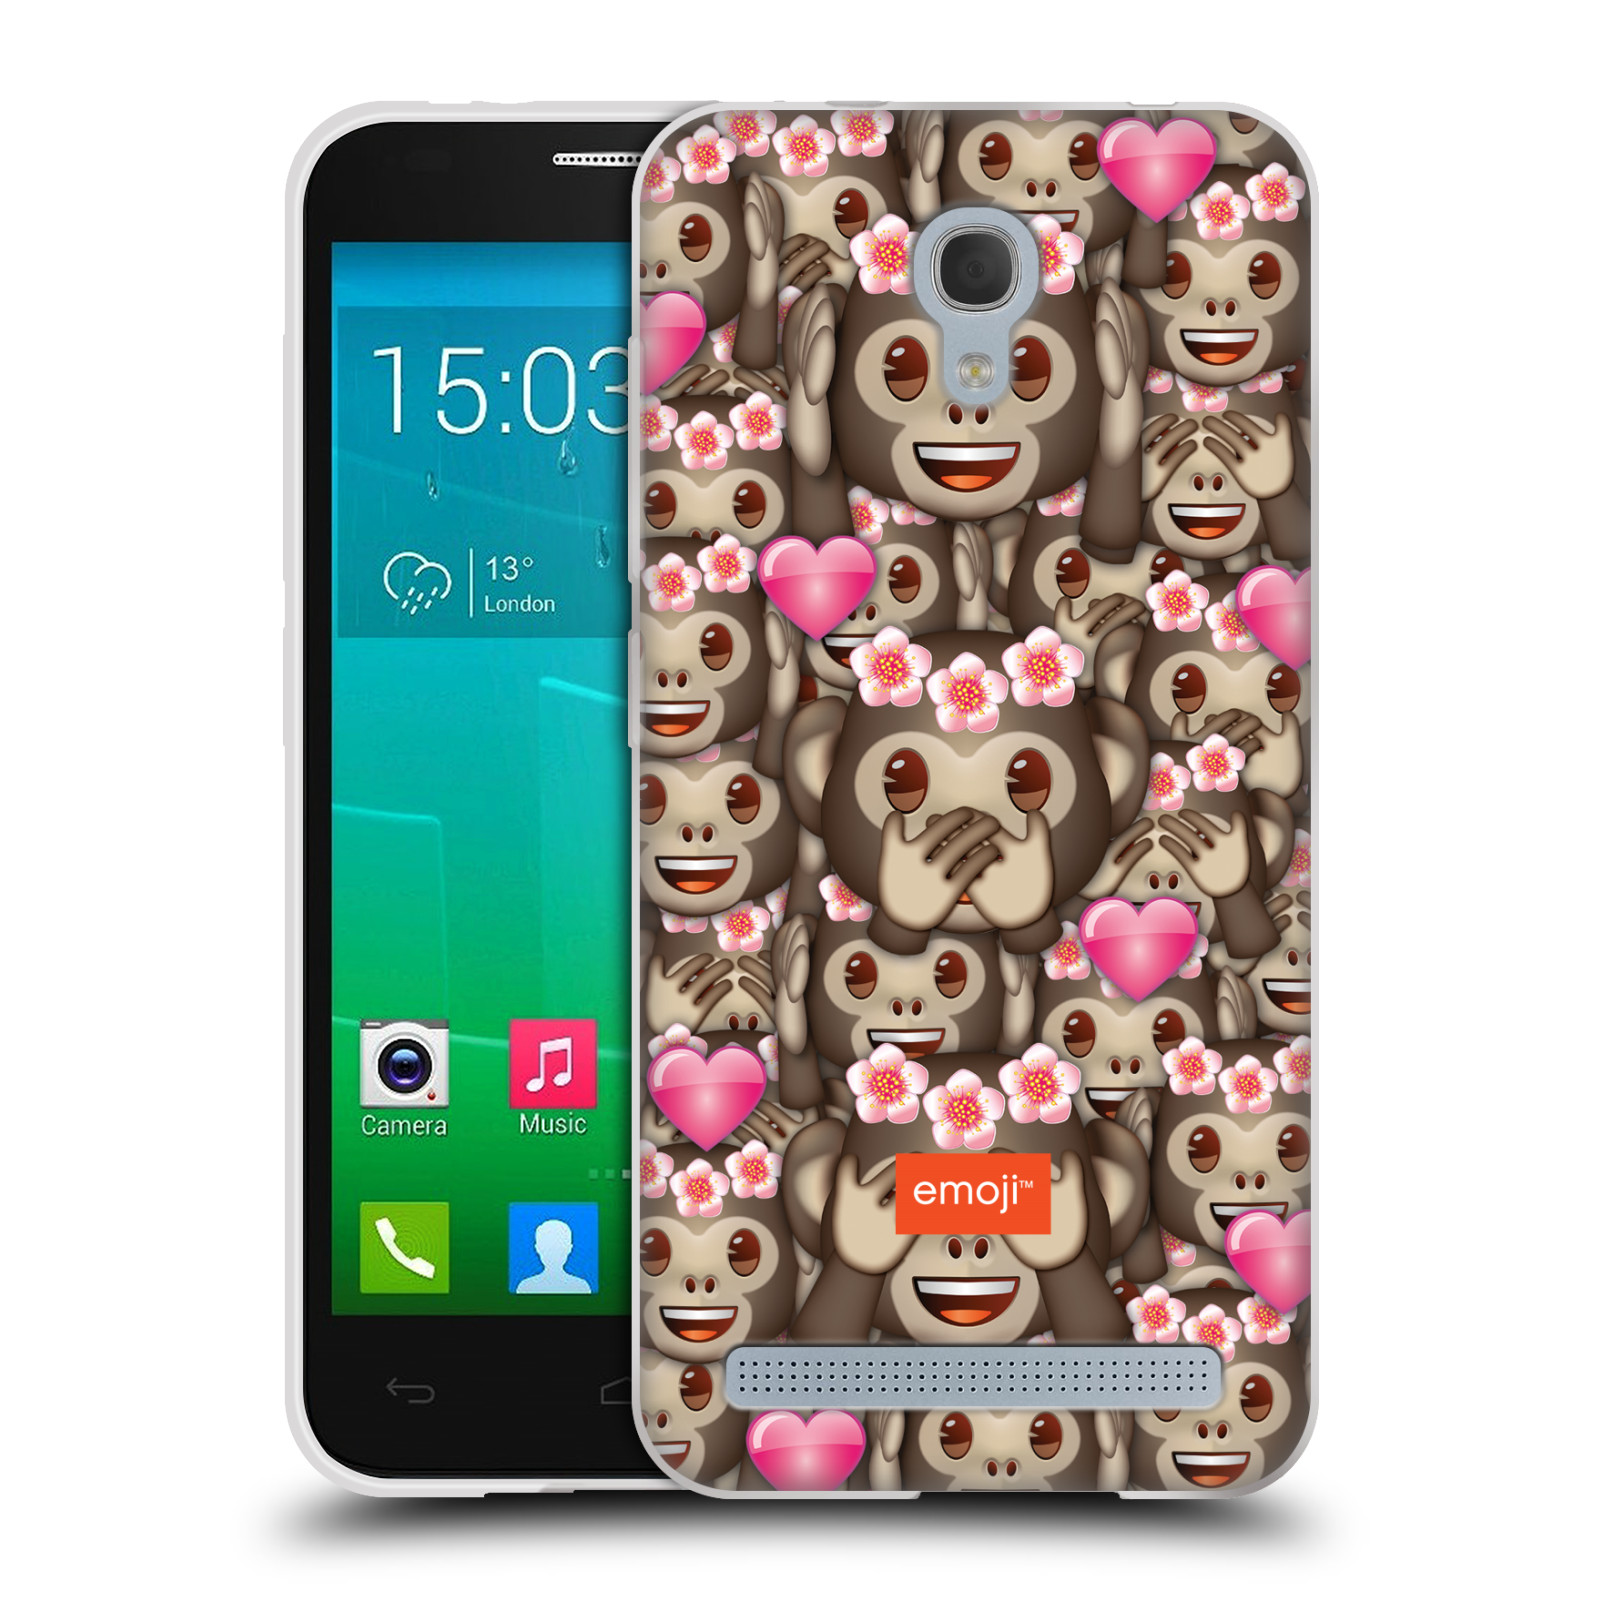 Silikonové pouzdro na mobil Alcatel One Touch Idol 2 Mini S 6036Y HEAD CASE EMOJI - Opičky, srdíčka a kytičky (Silikonový kryt či obal s oficiálním motivem EMOJI na mobilní telefon Alcatel Idol 2 Mini S OT-6036Y)